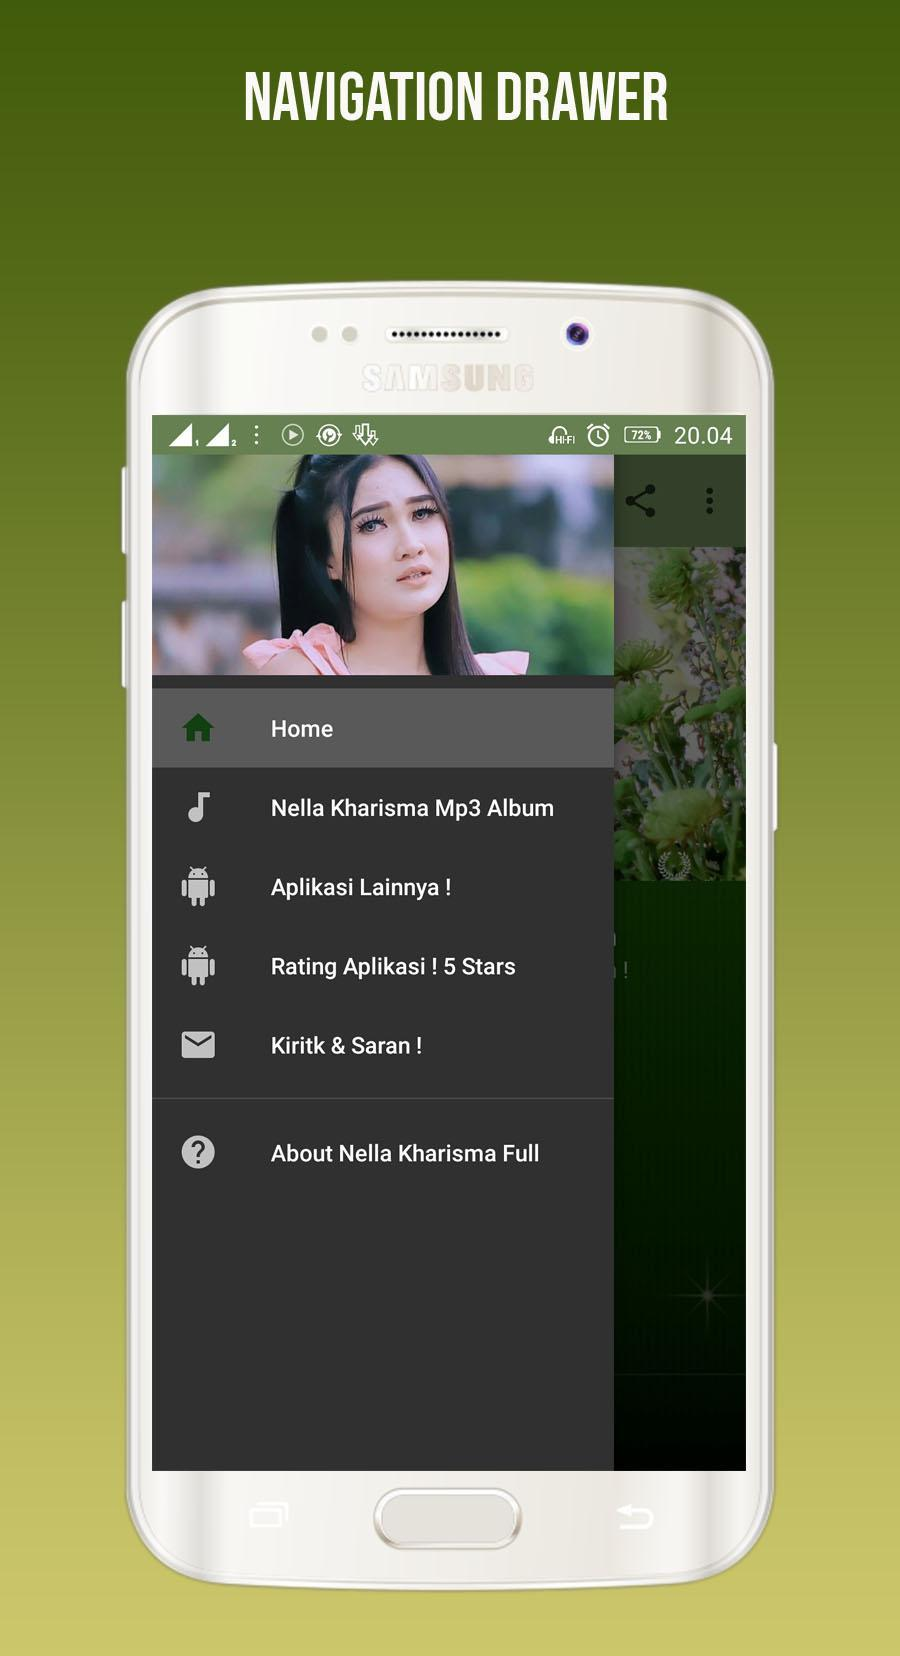 nella kharisma album terbaru mp3 download